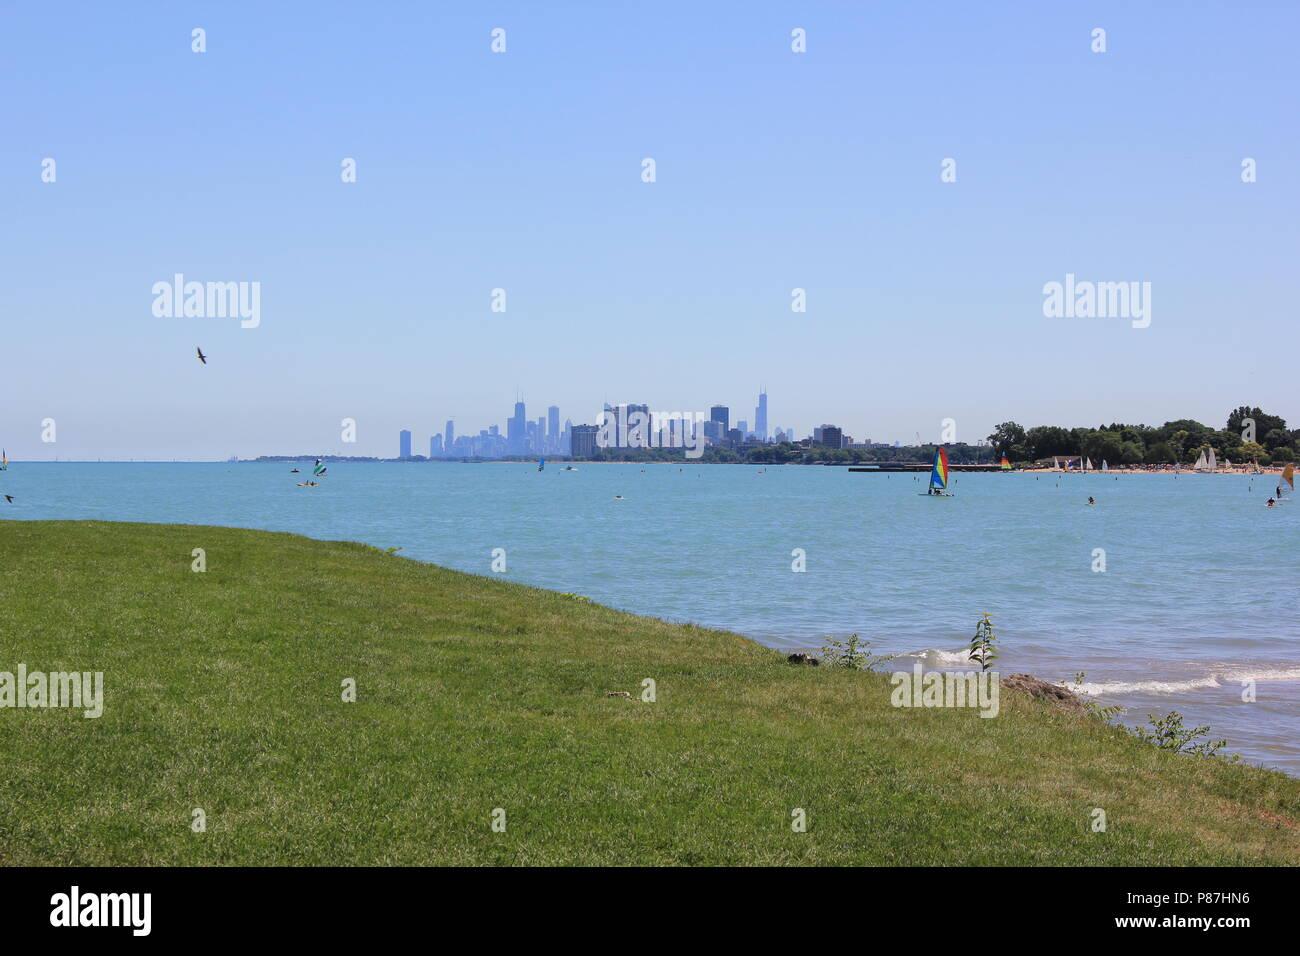 Northwestern University Park on the Lake in Evanston, Illinois on a beautiful sunny summer day. - Stock Image